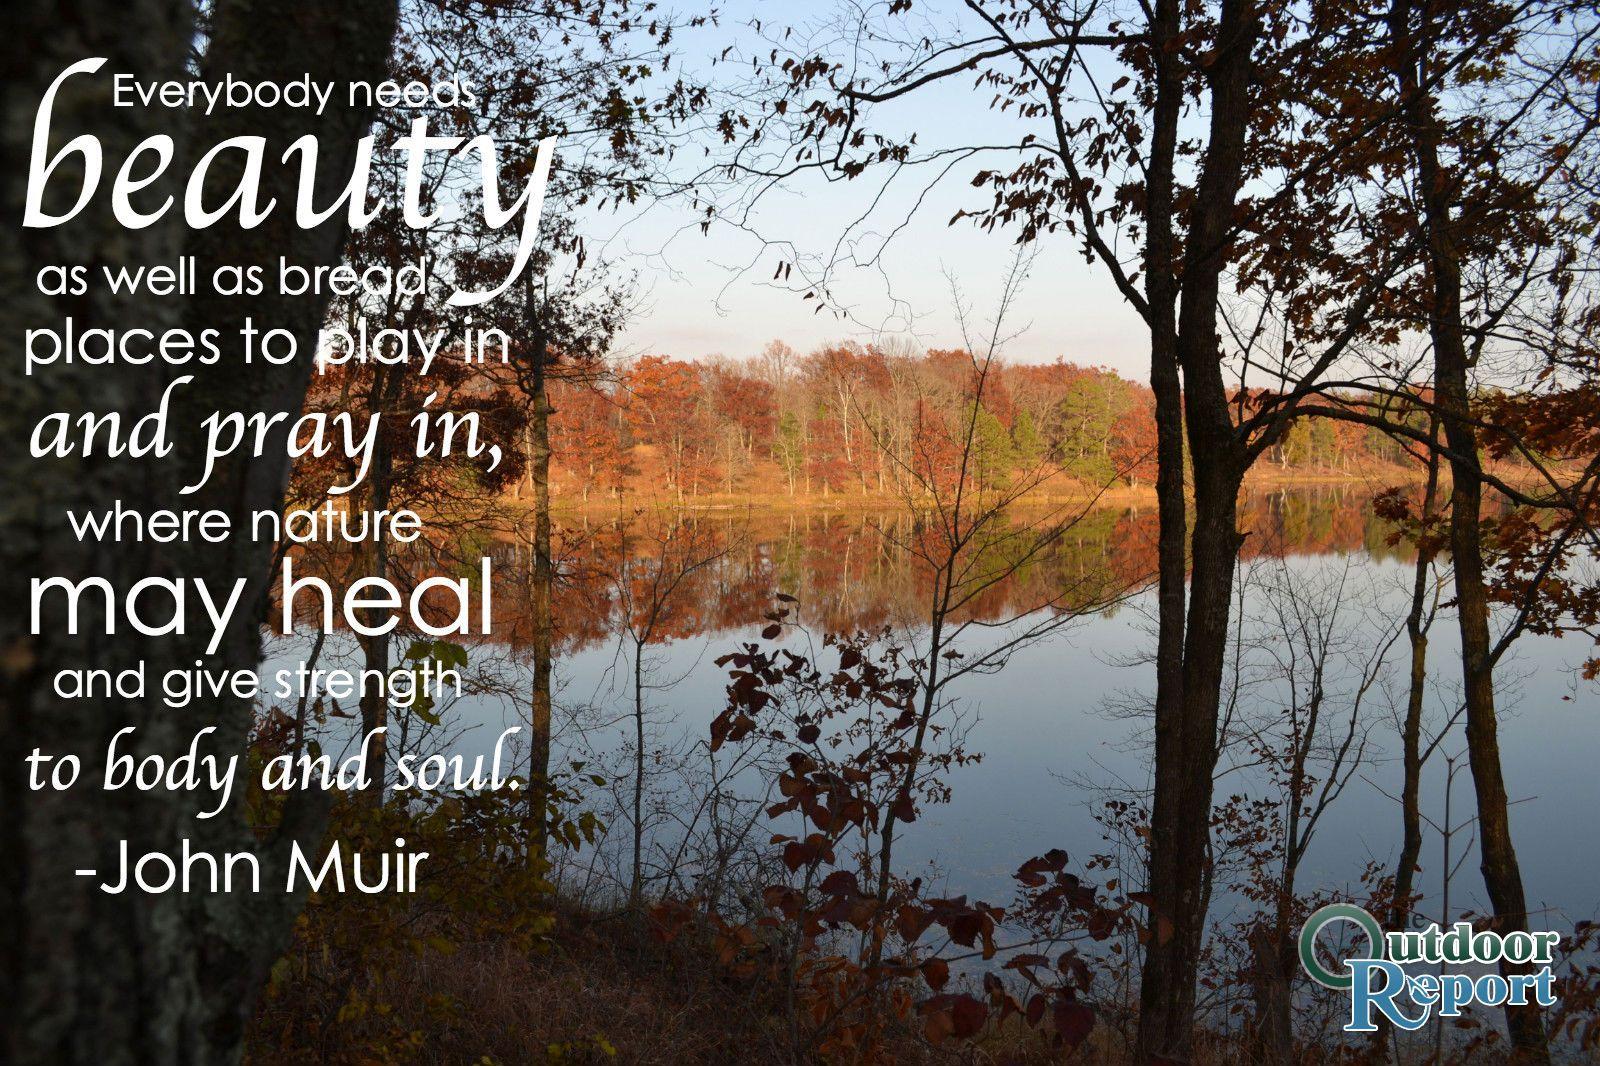 Attrayant John Muir Nature Quote